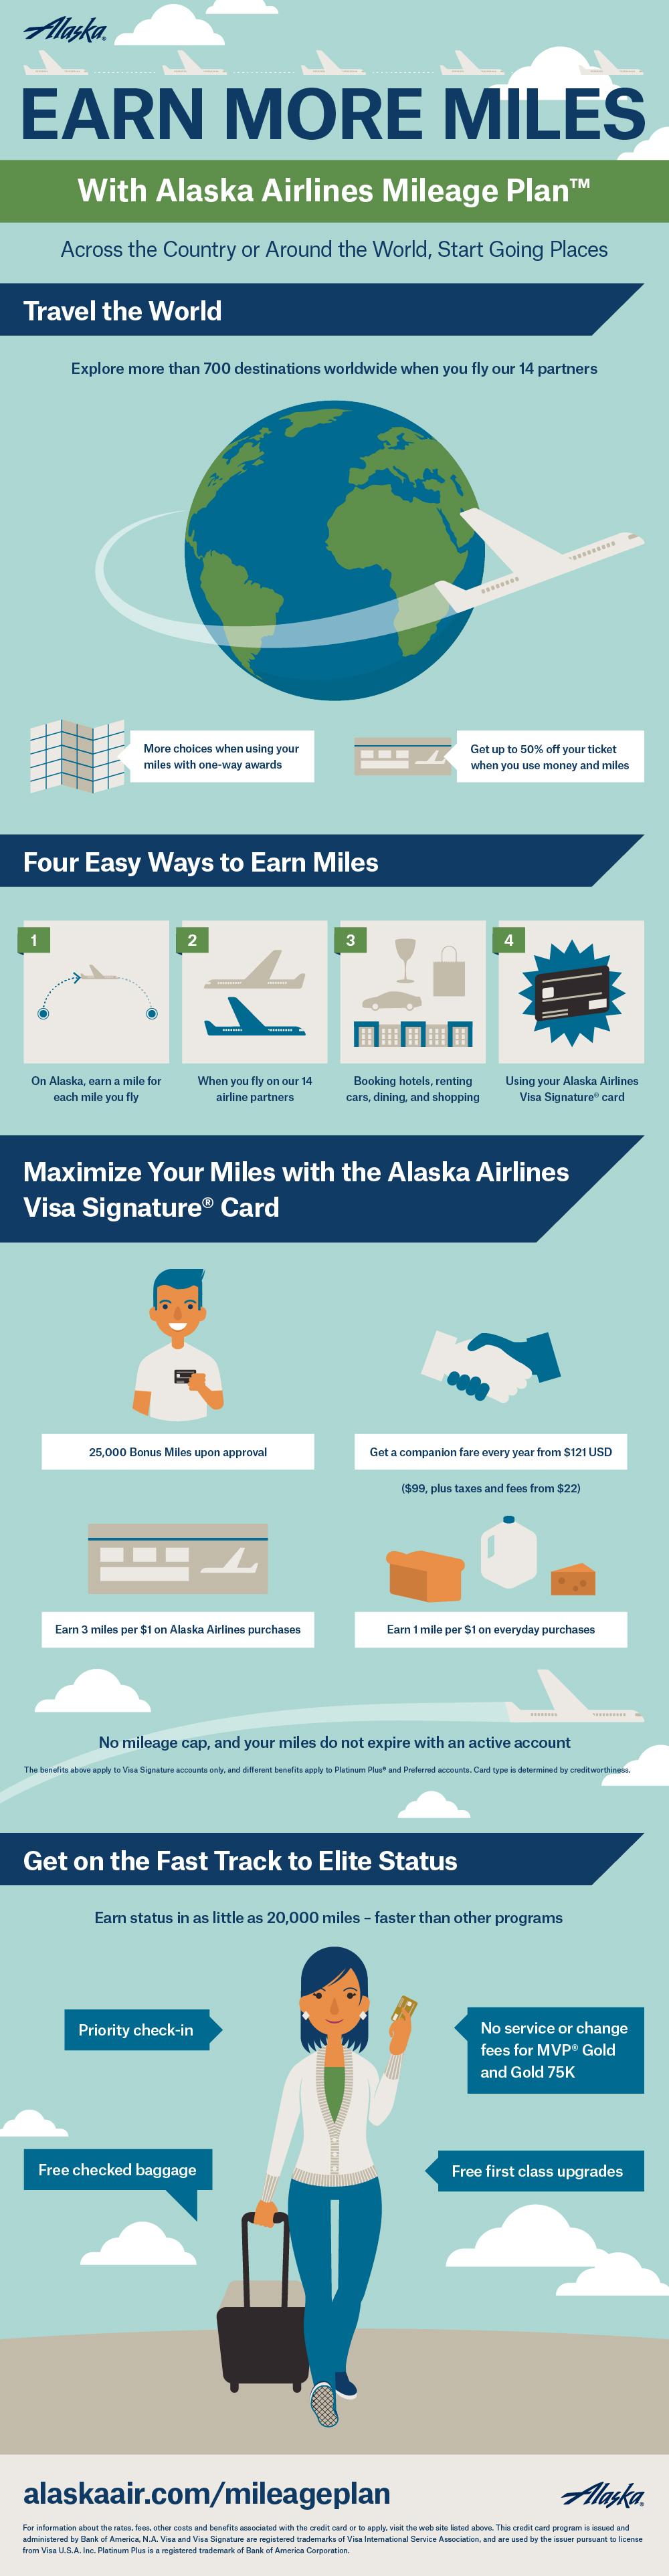 Alaska-Air-Mileage-Plan-2-18-15